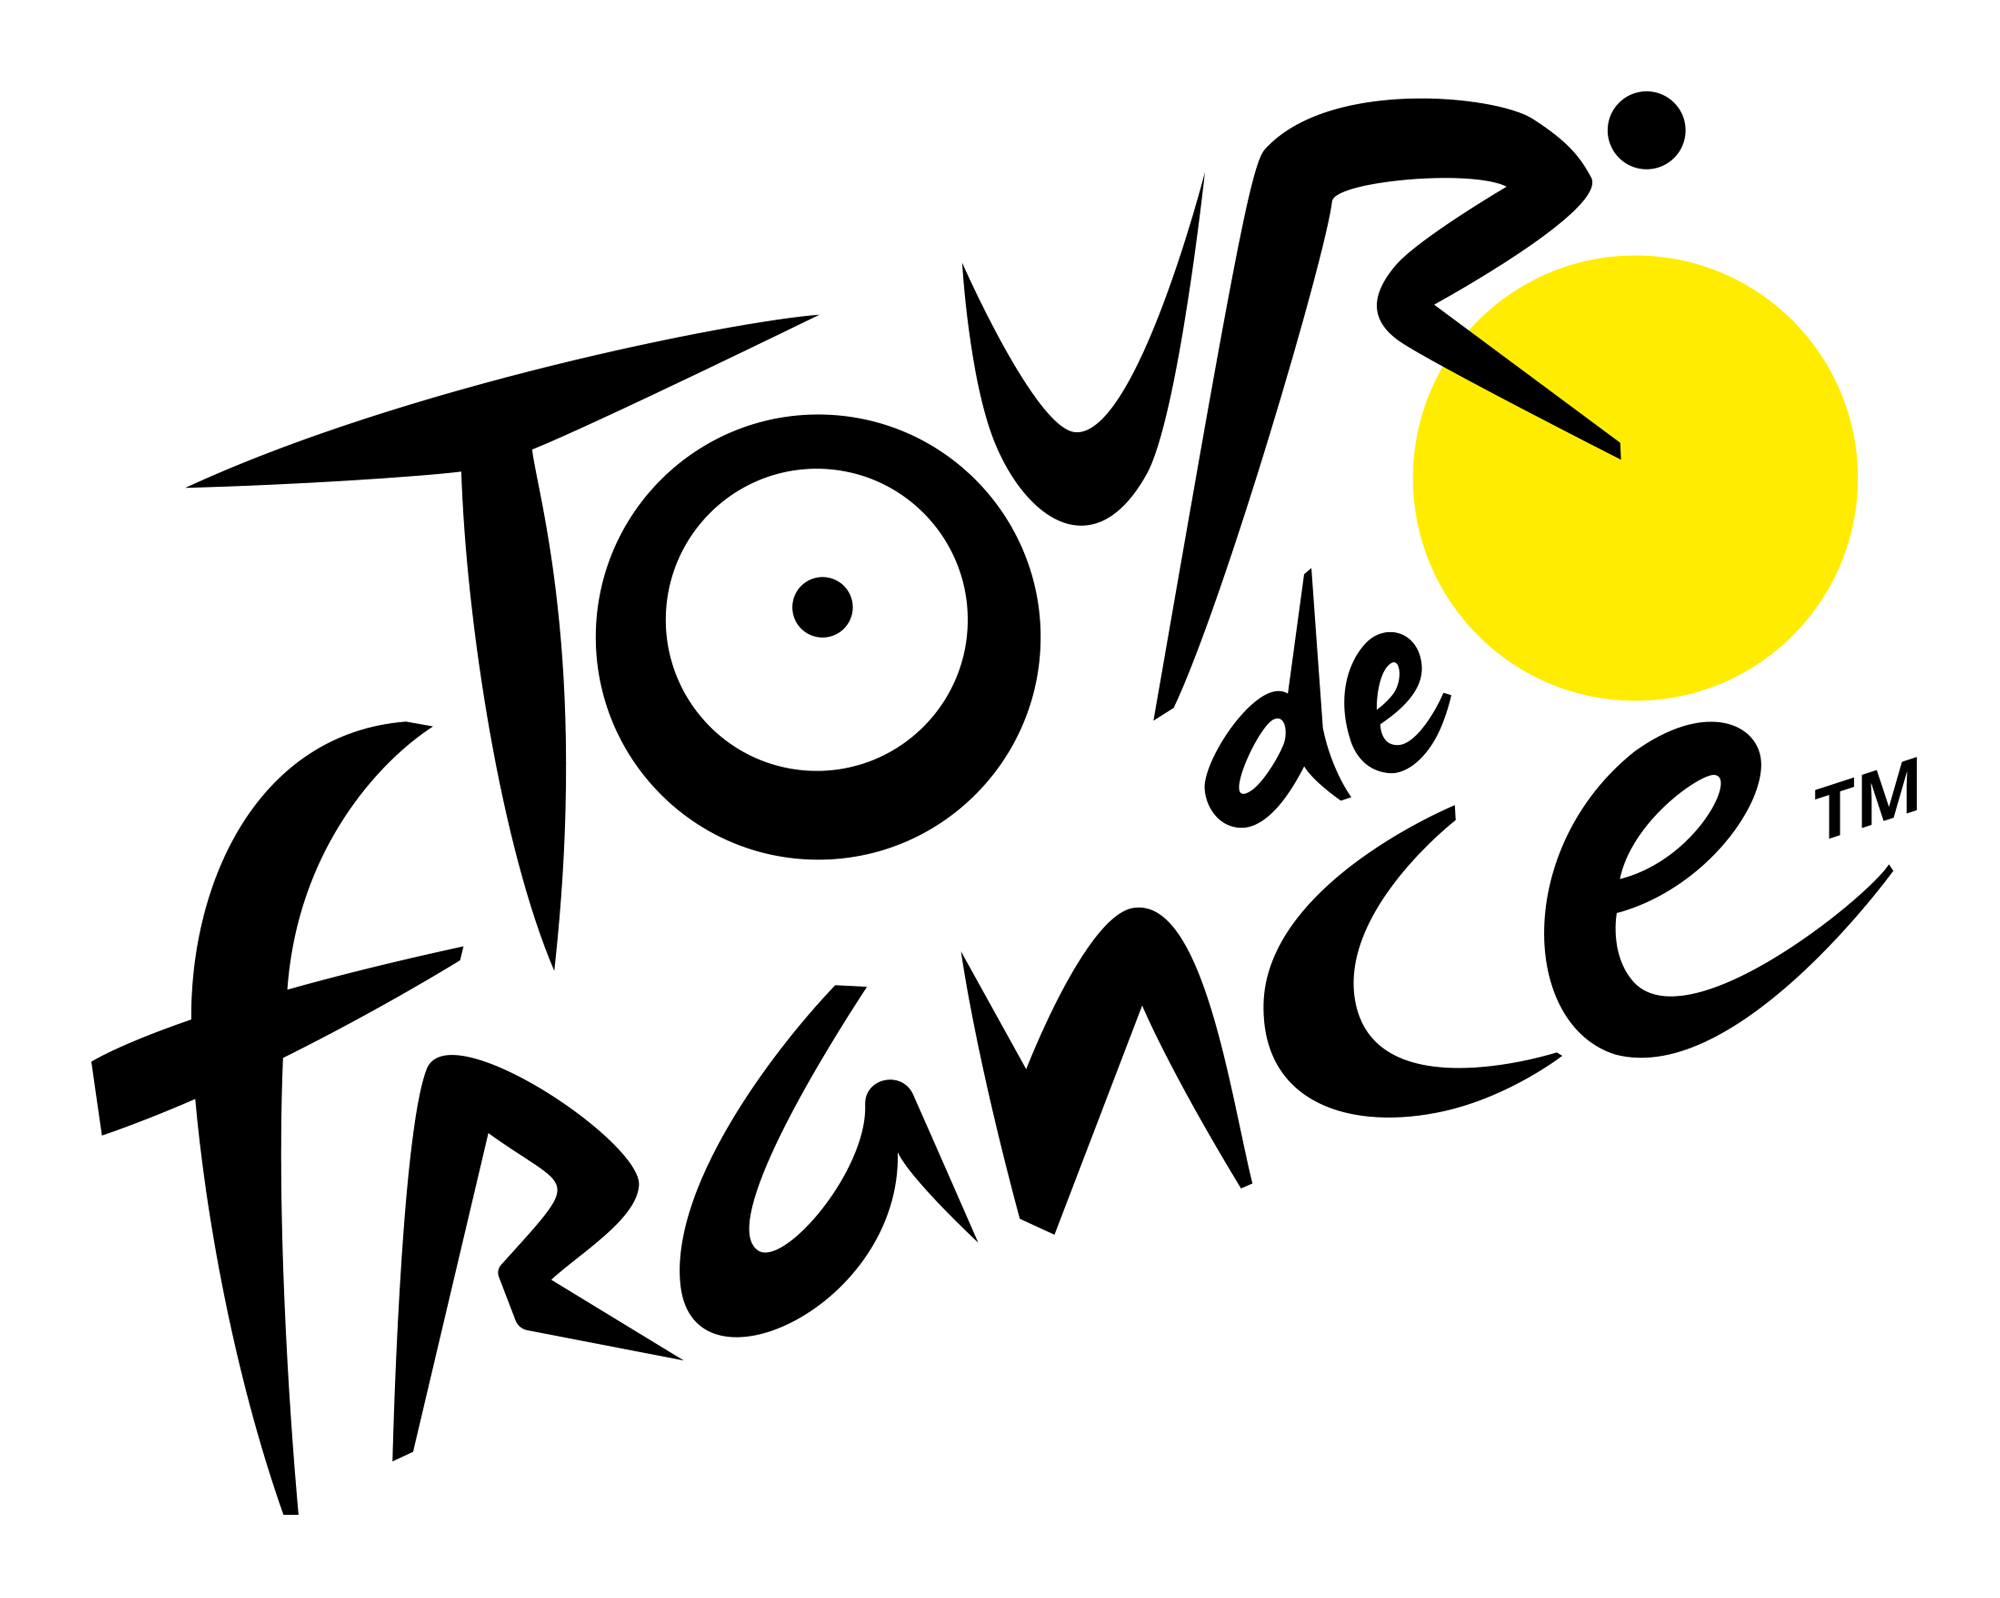 New Logo for Tour de France